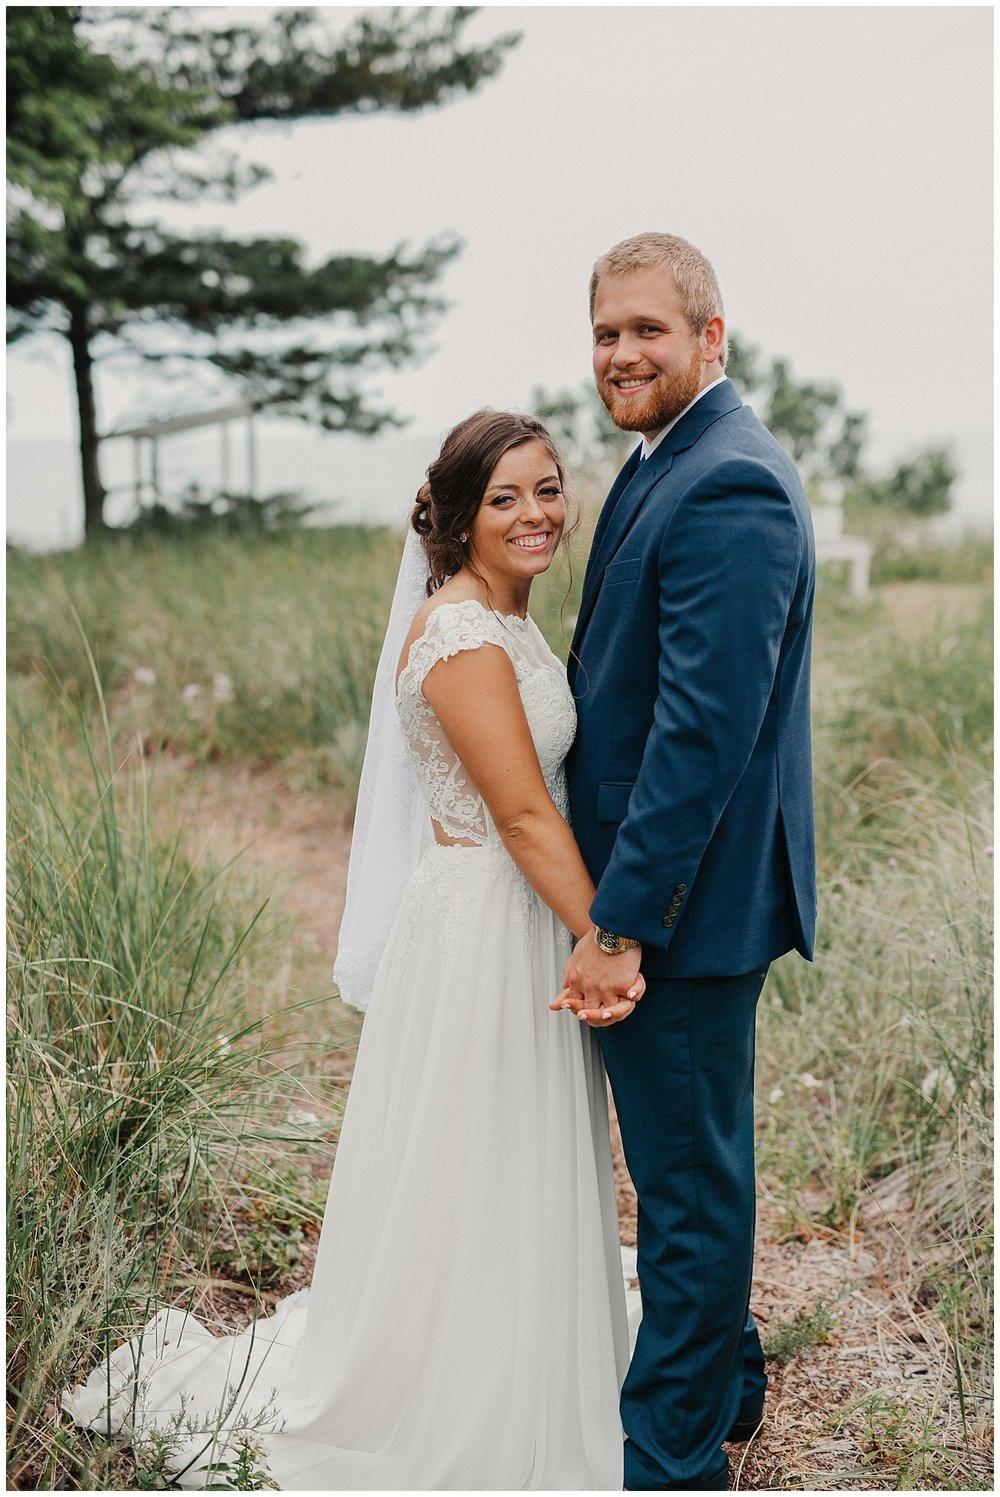 lindybeth photography - rodgers wedding - blog-69.jpg